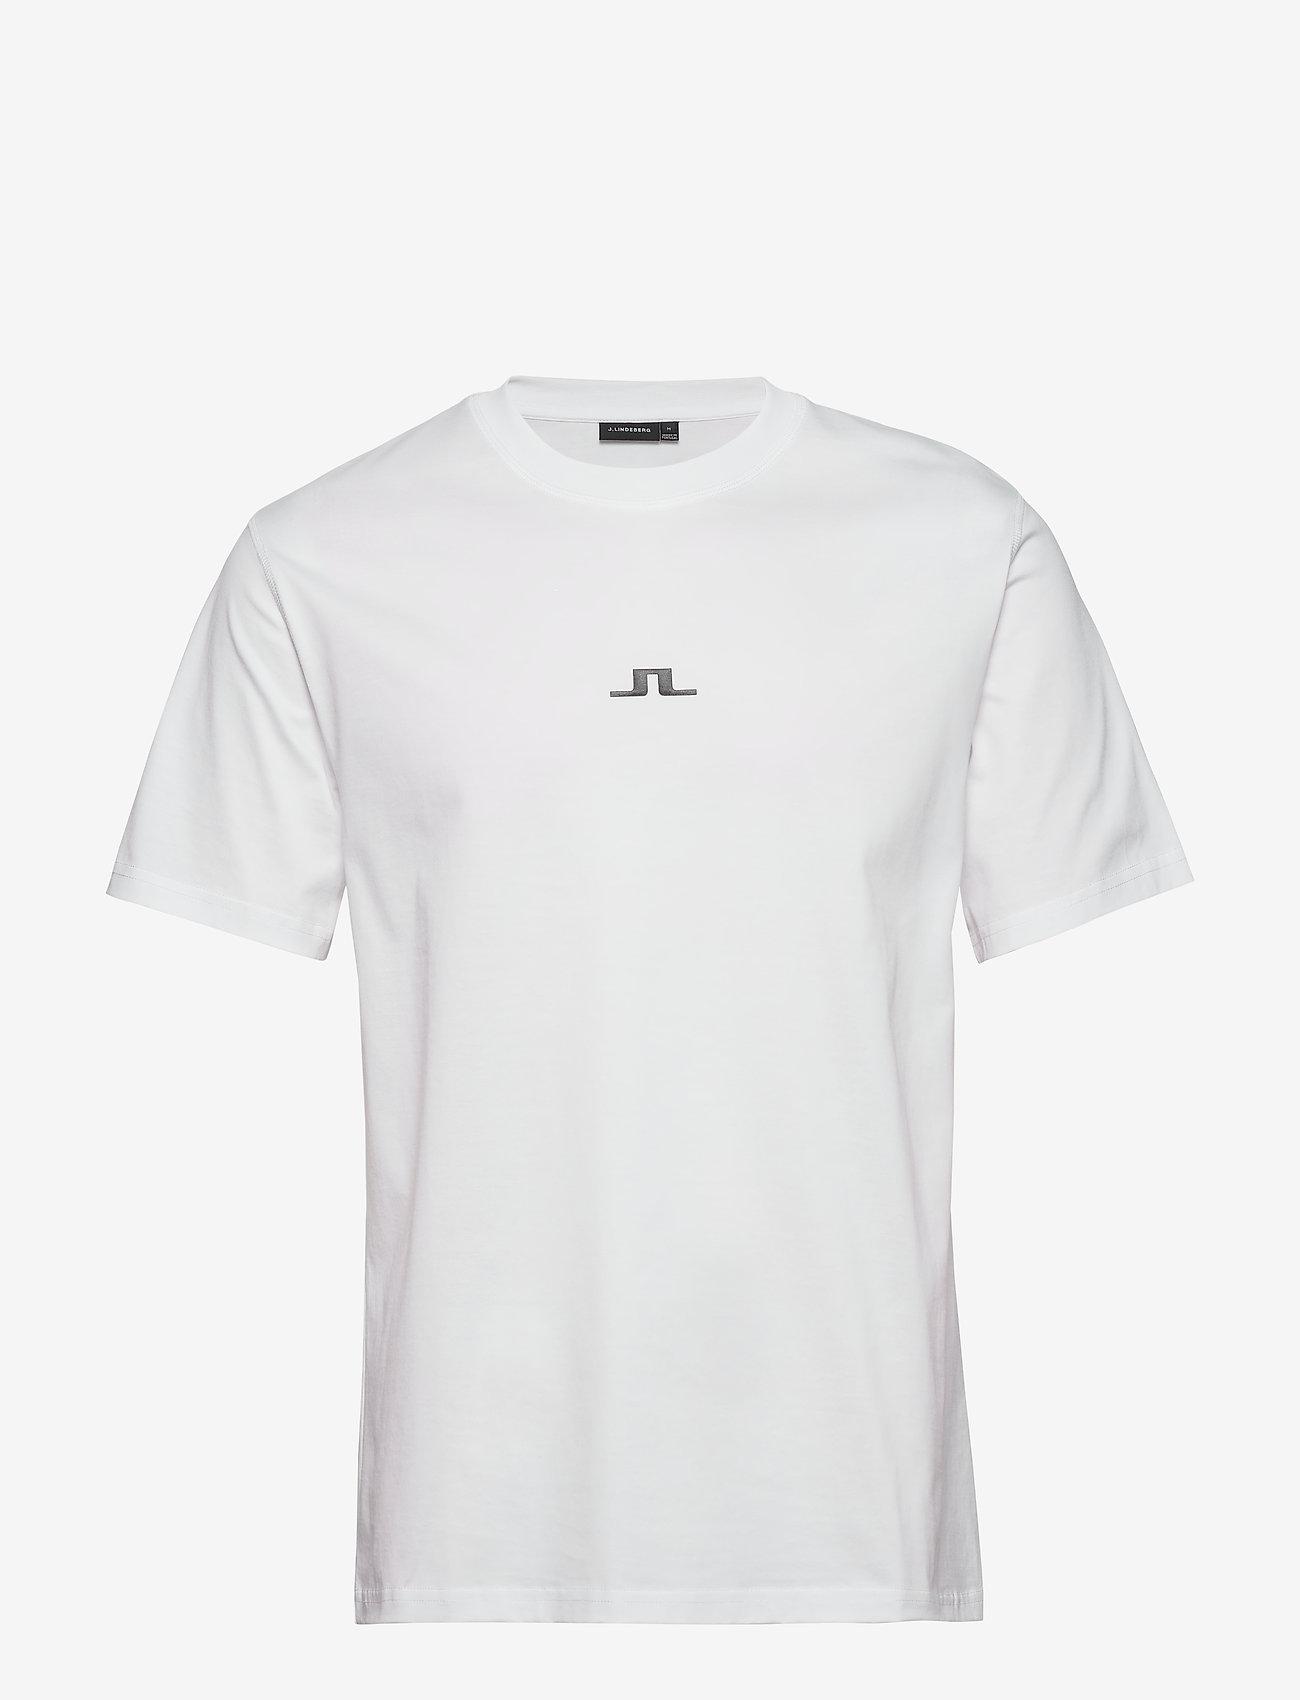 J. Lindeberg - Jordan Bridge t-shirt cotton - basic t-shirts - white - 0